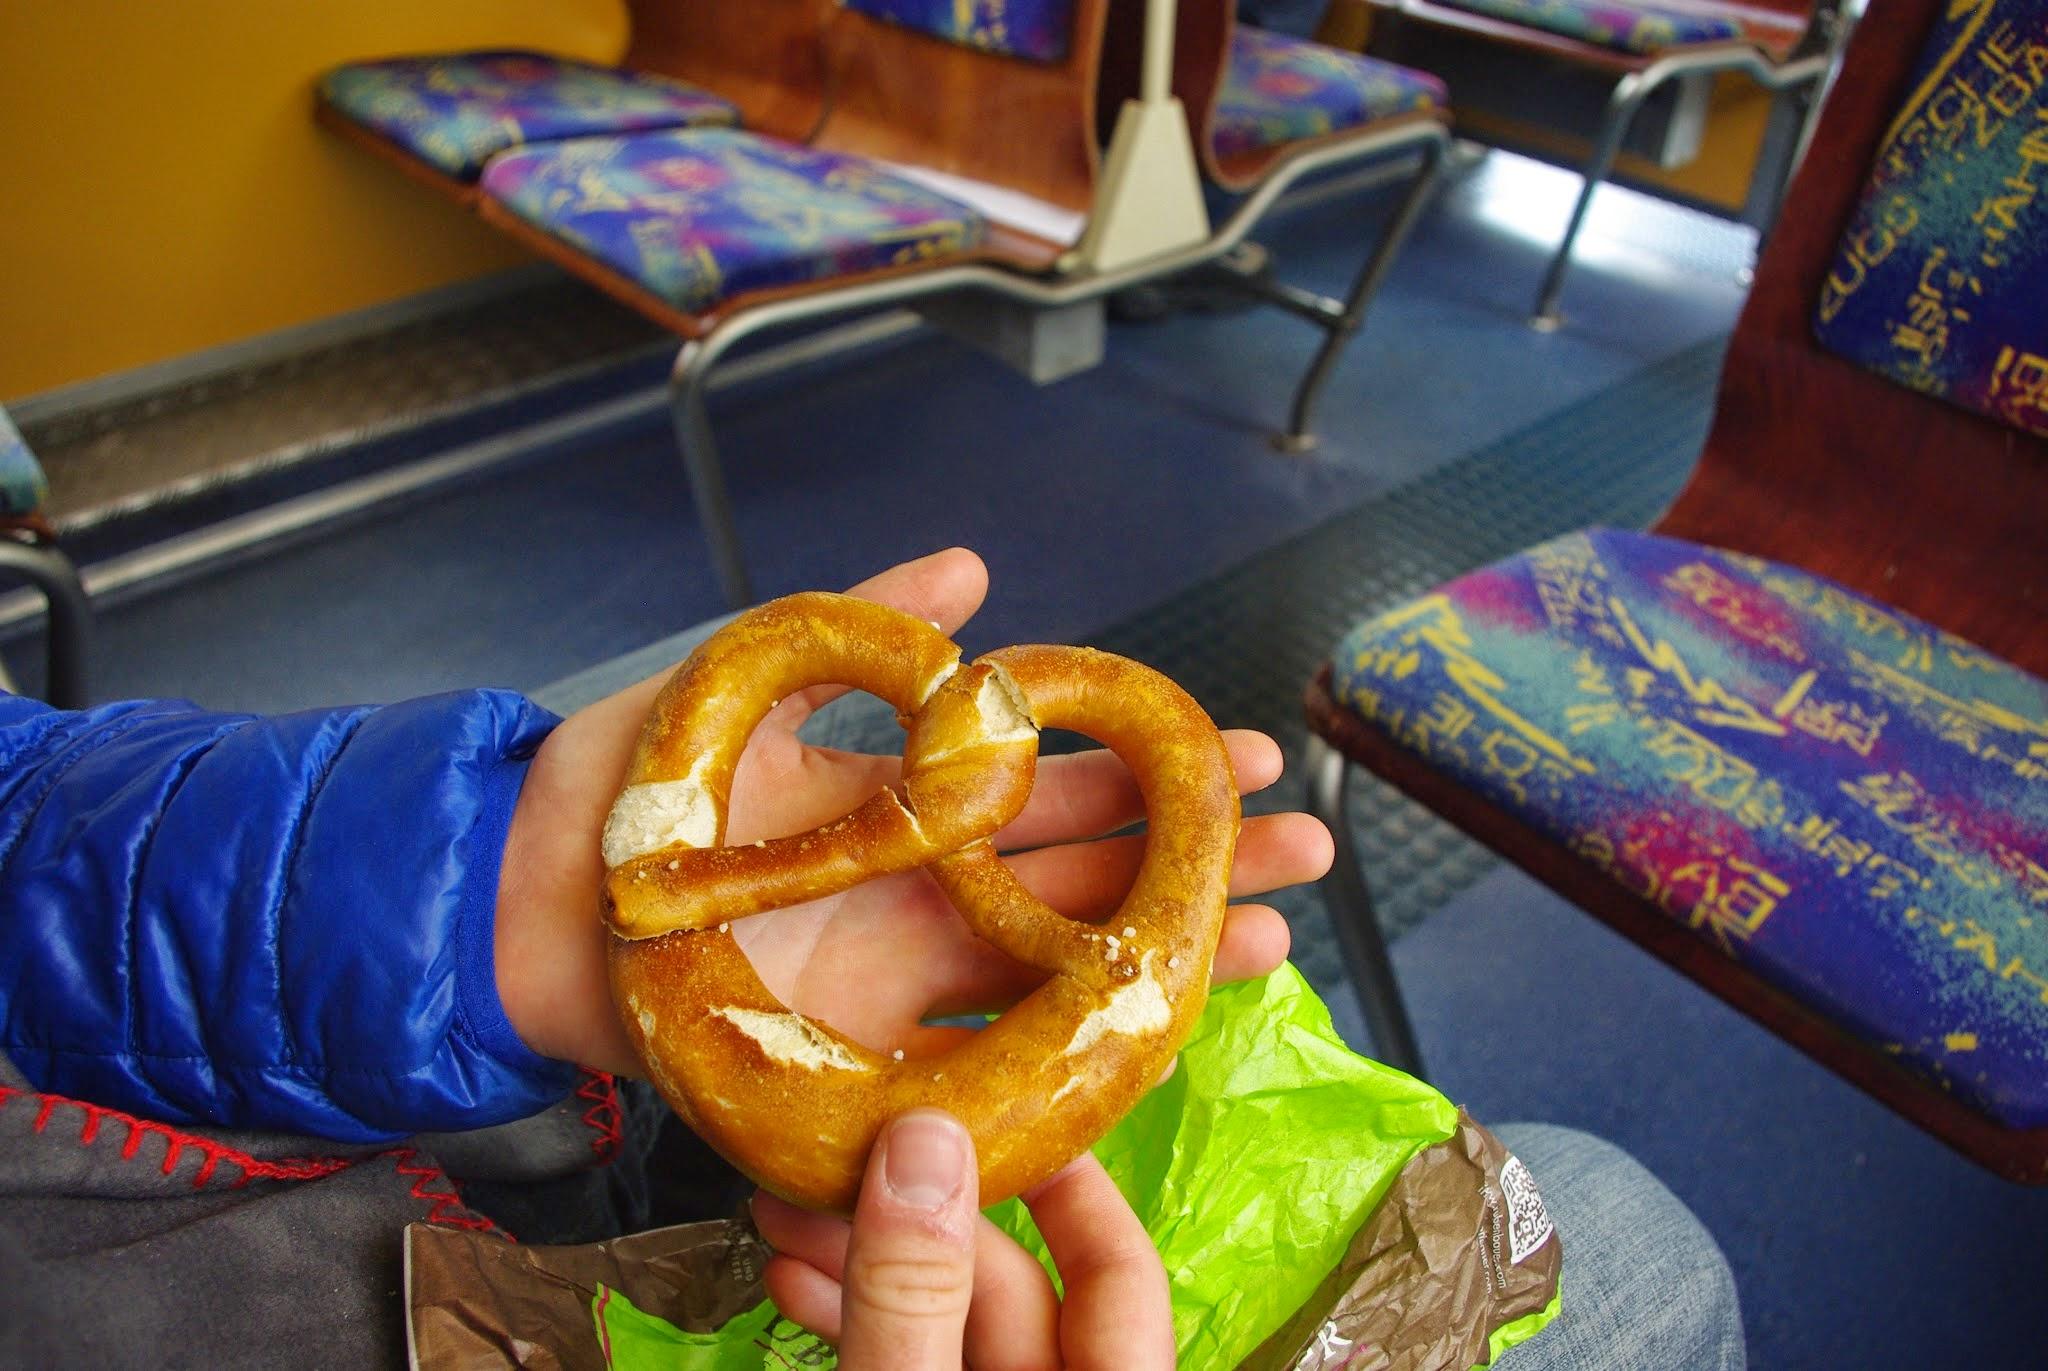 A very Bavarian scene: a pretzel on the cogwheel train up to the plateau, the Zugspitzplatt.